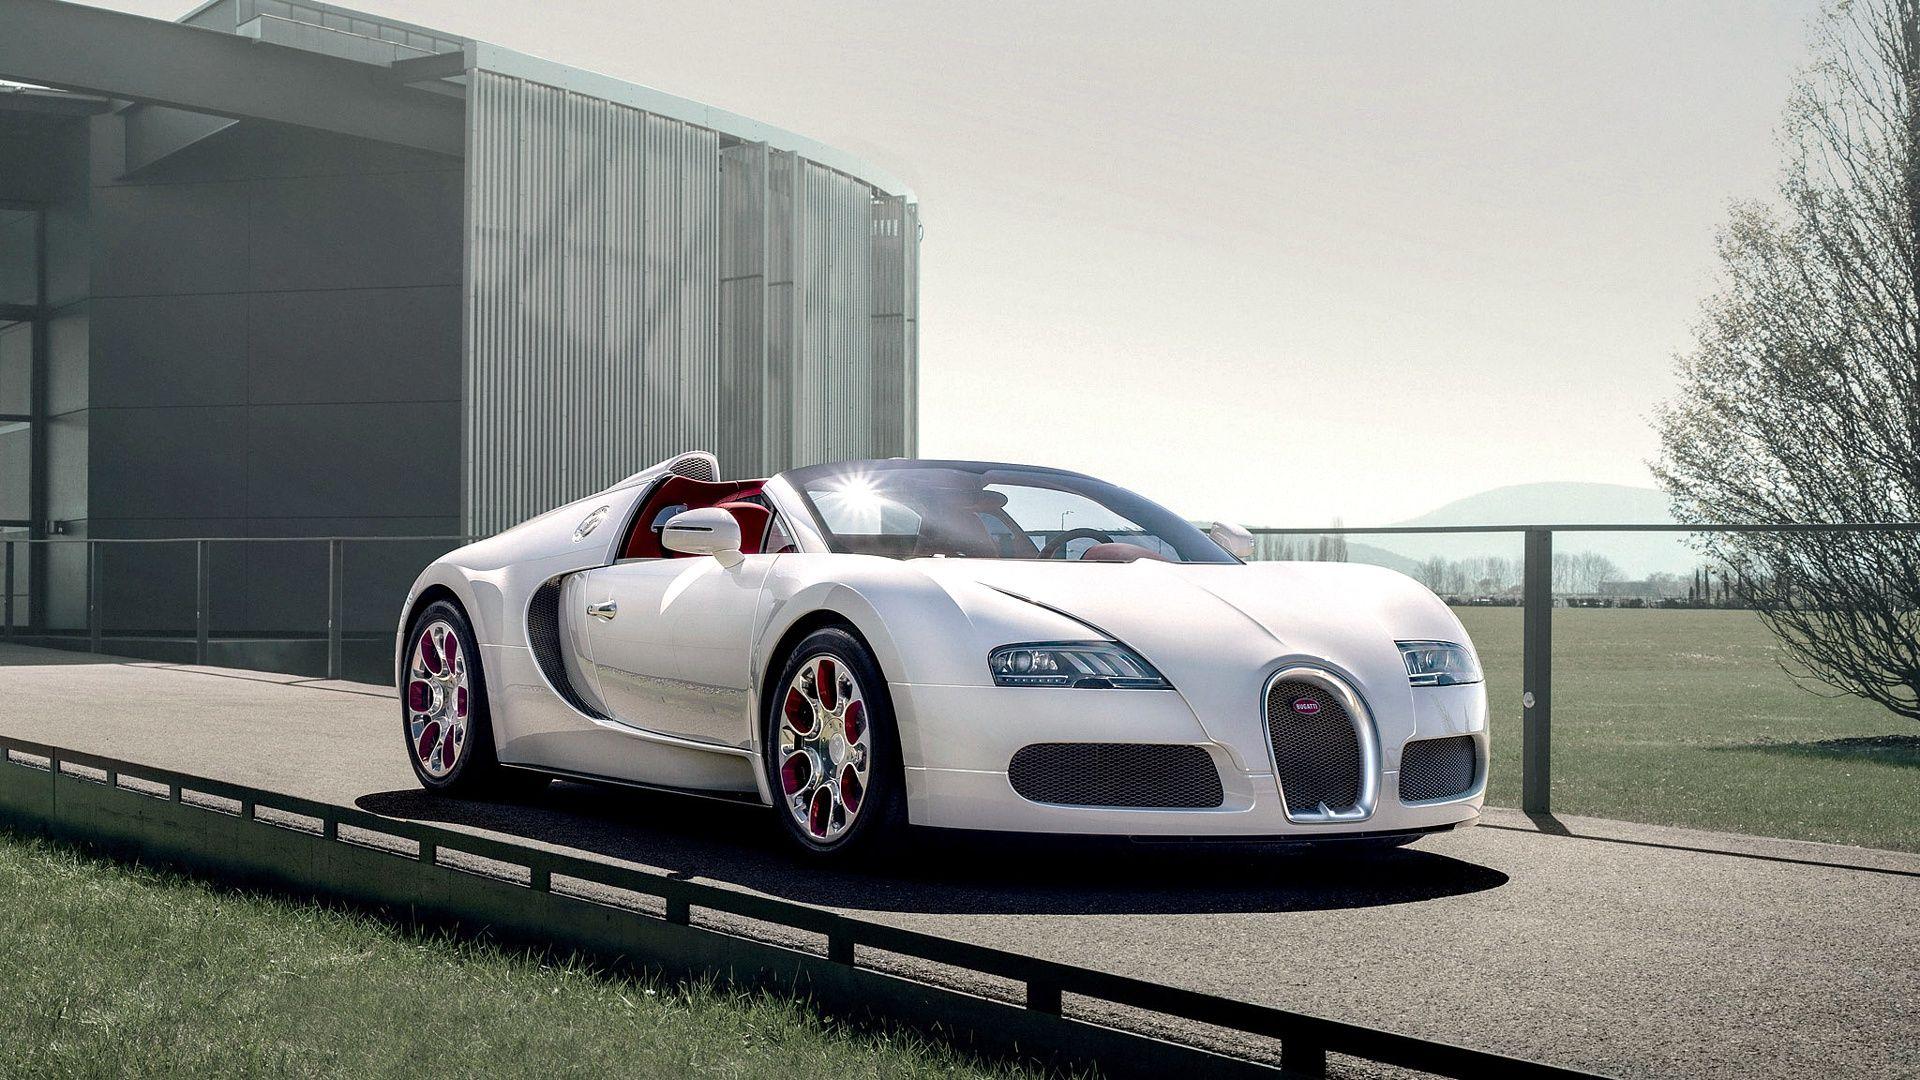 b18f06feb563feab9efc564336839b3c Extraordinary Bugatti Veyron Grand Sport Vitesse Real Racing 3 Cars Trend